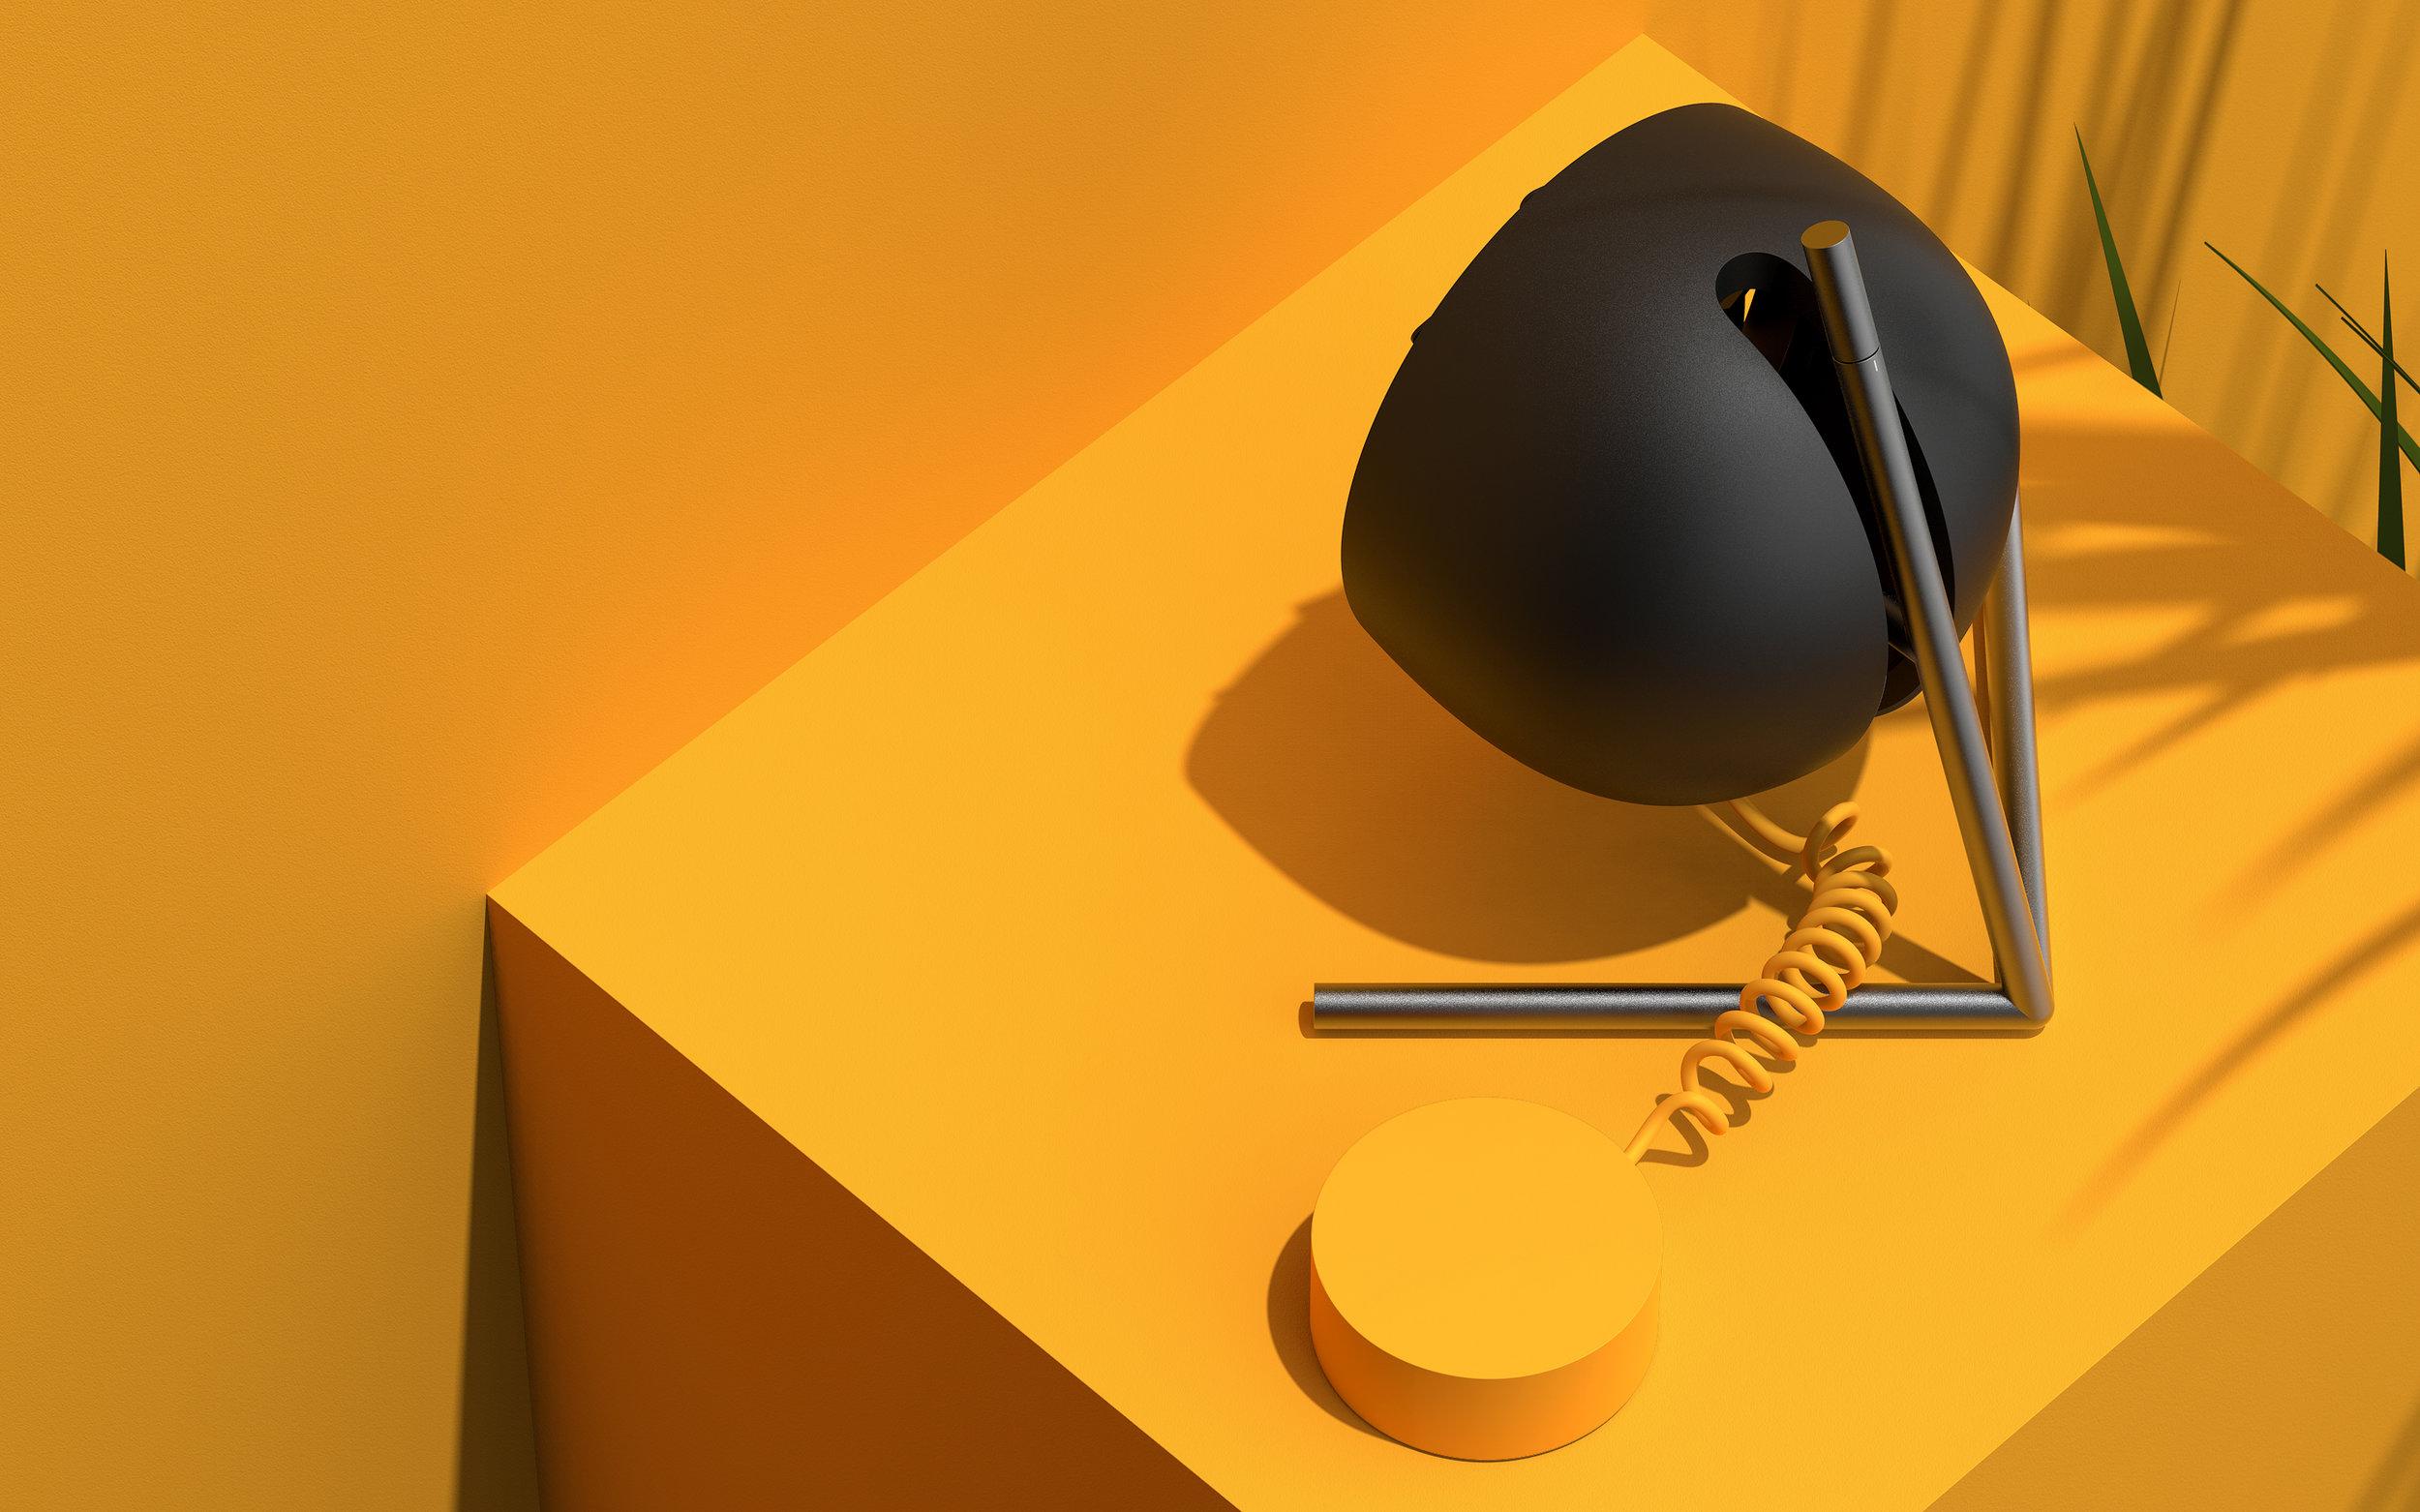 BlowingWithCS-Industrial-Design-Desk-Fan-Puck-Design-4.jpg